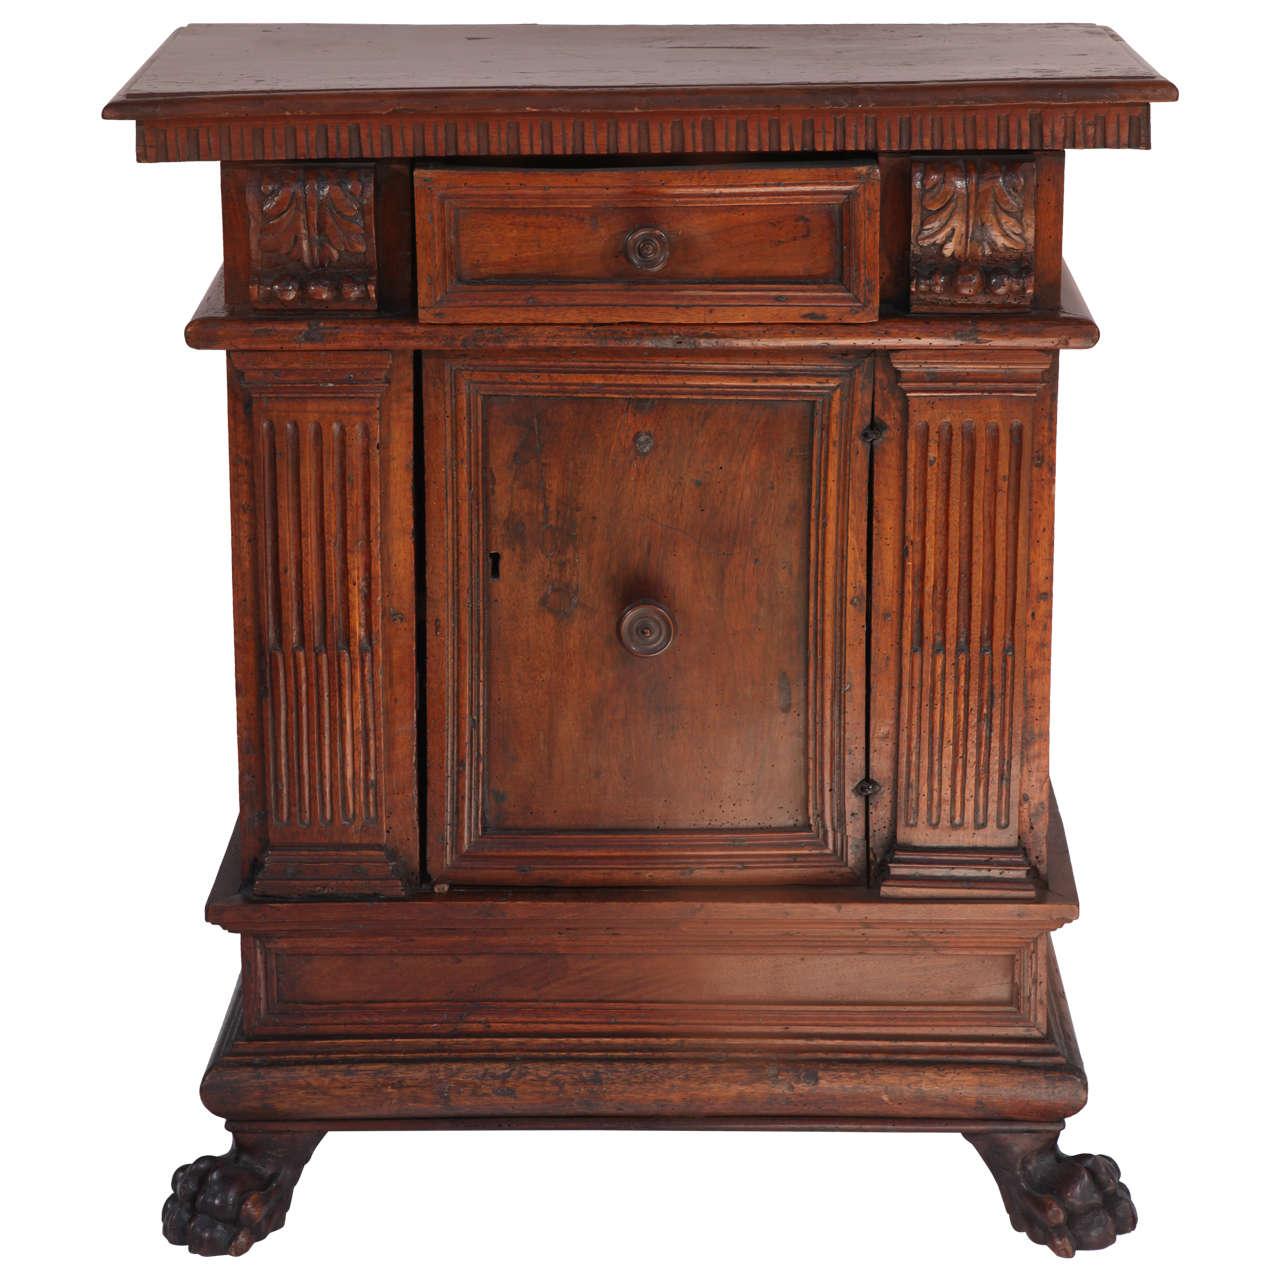 Gentil 18th Century Italian Renaissance Walnut Cabinet For Sale